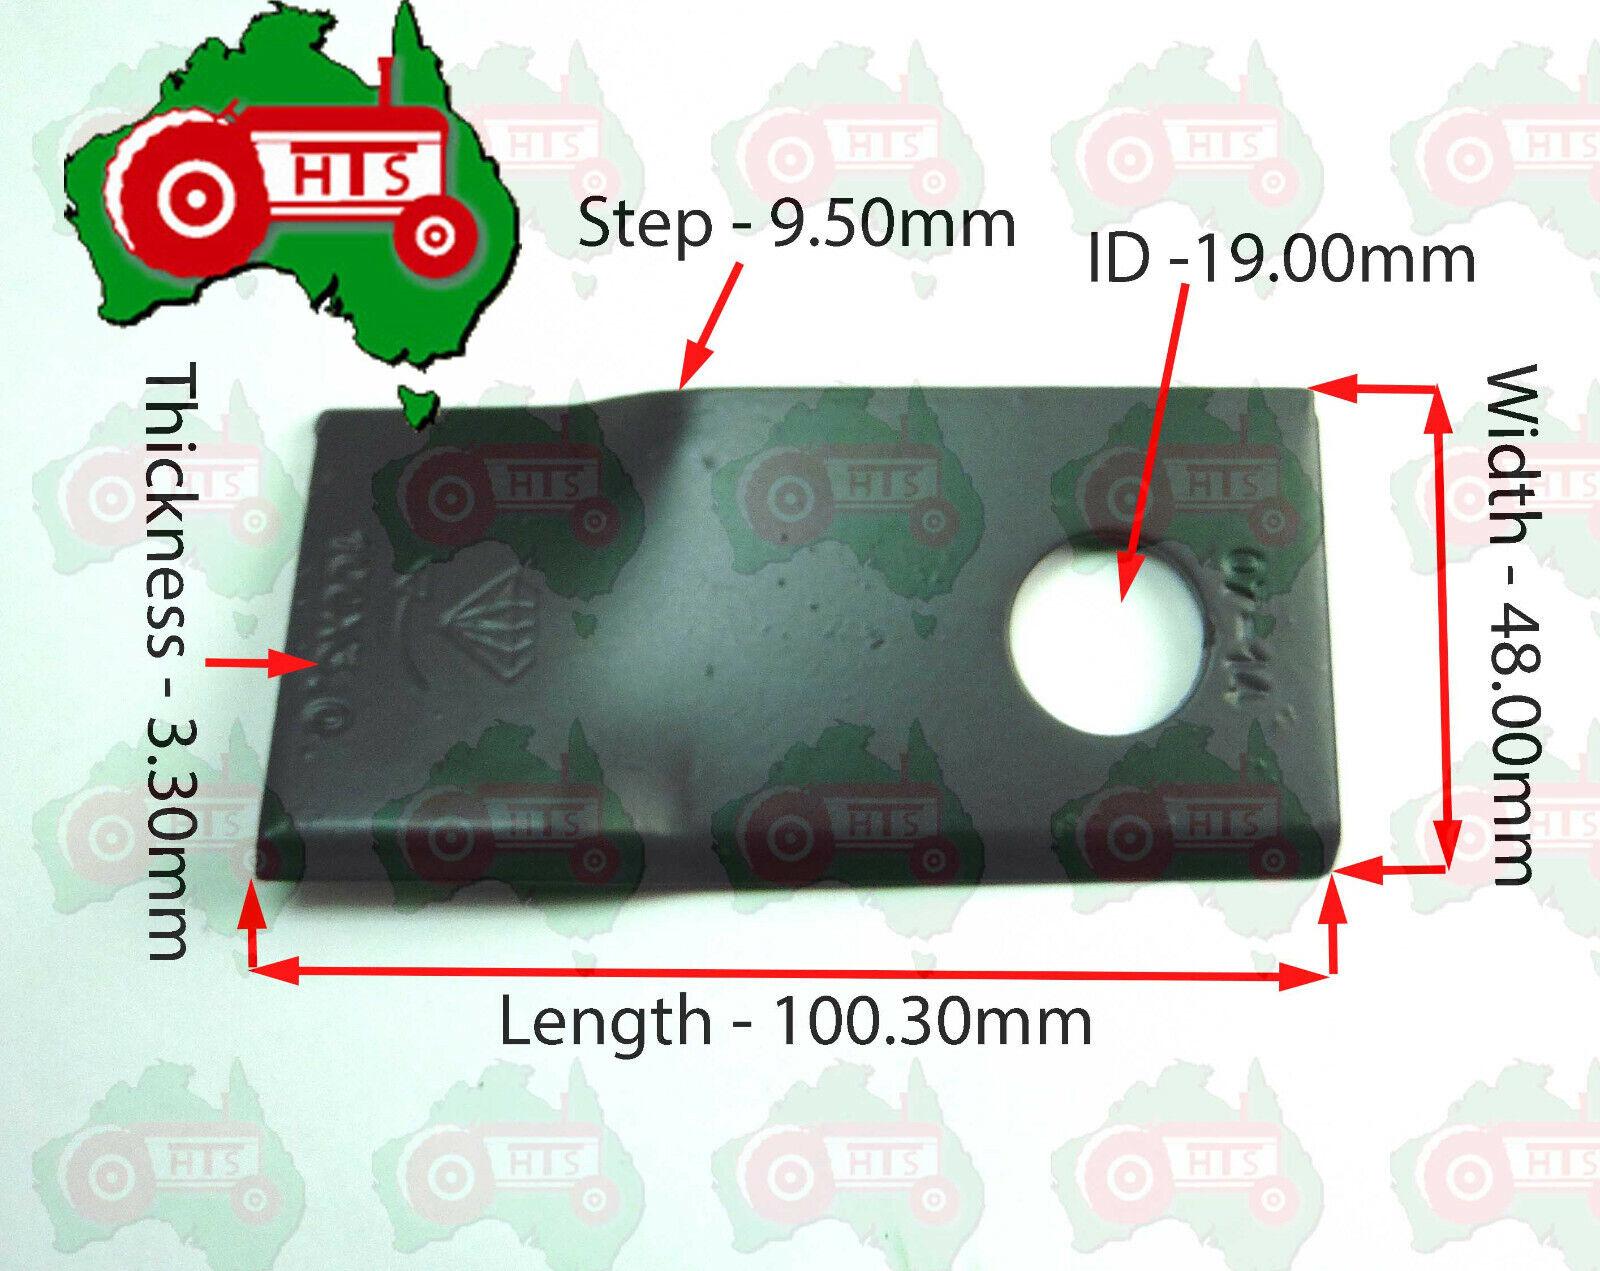 126mm x 47mm x 4mm Hay RH Blade Disc Mower TAARUP KVERNLAND ID 20mm